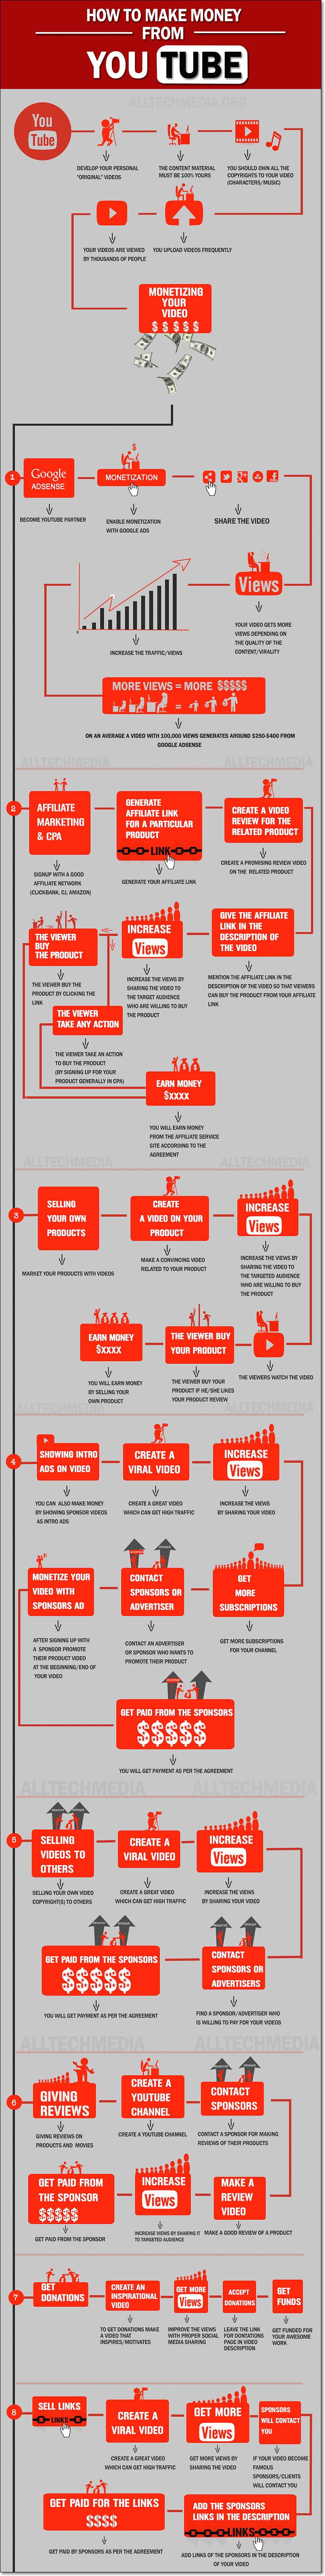 como hacer dinero con youtube infografia